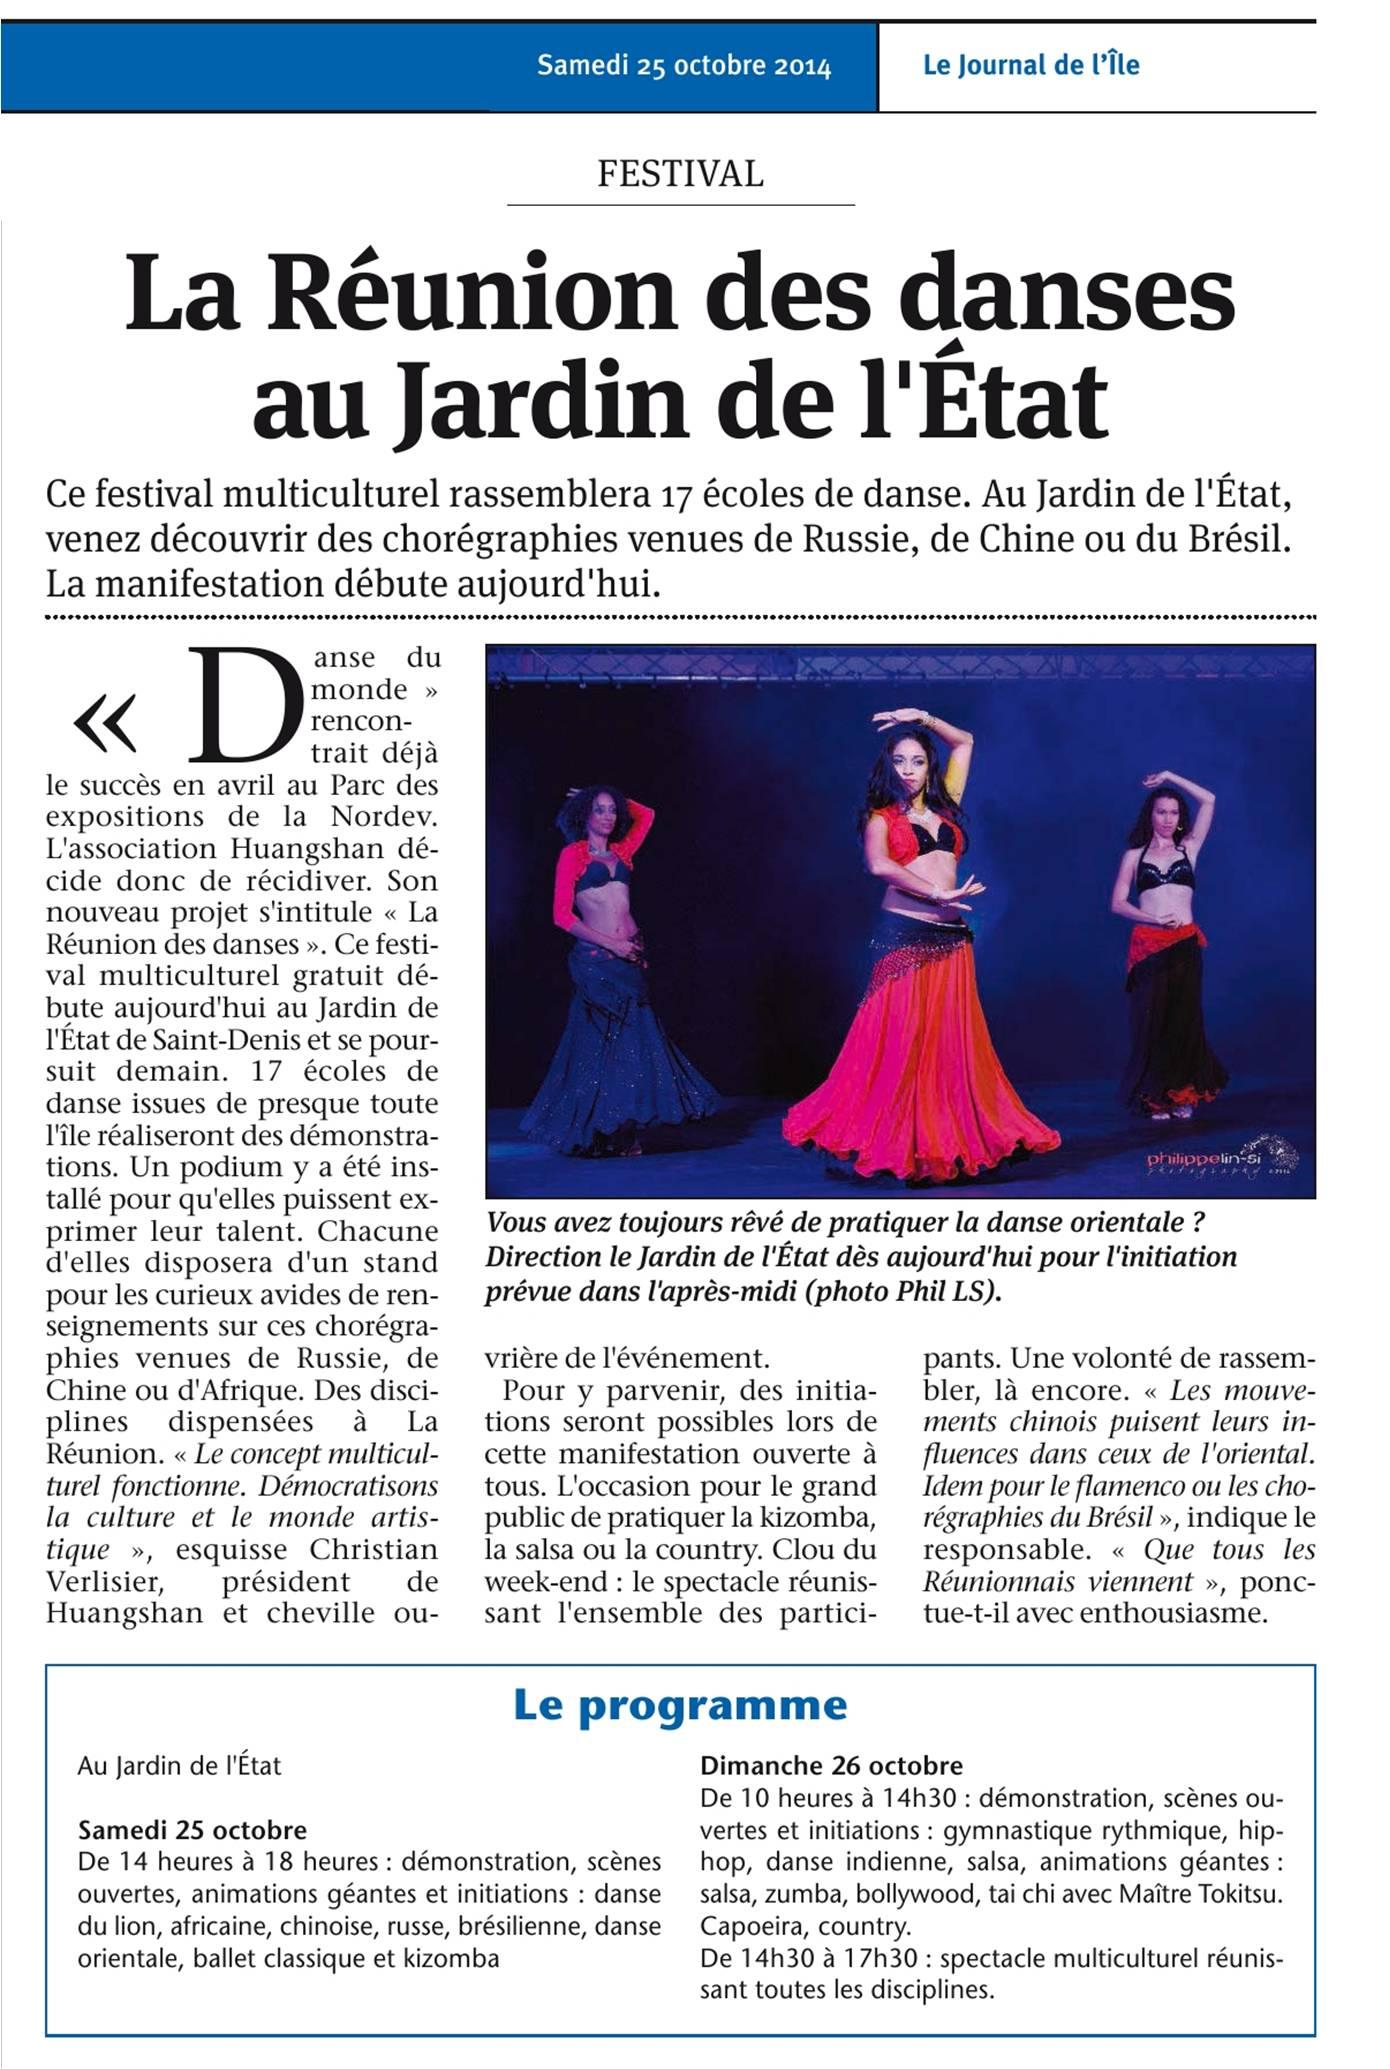 Page 16.JIR_DU_25-10-2014 ok 2